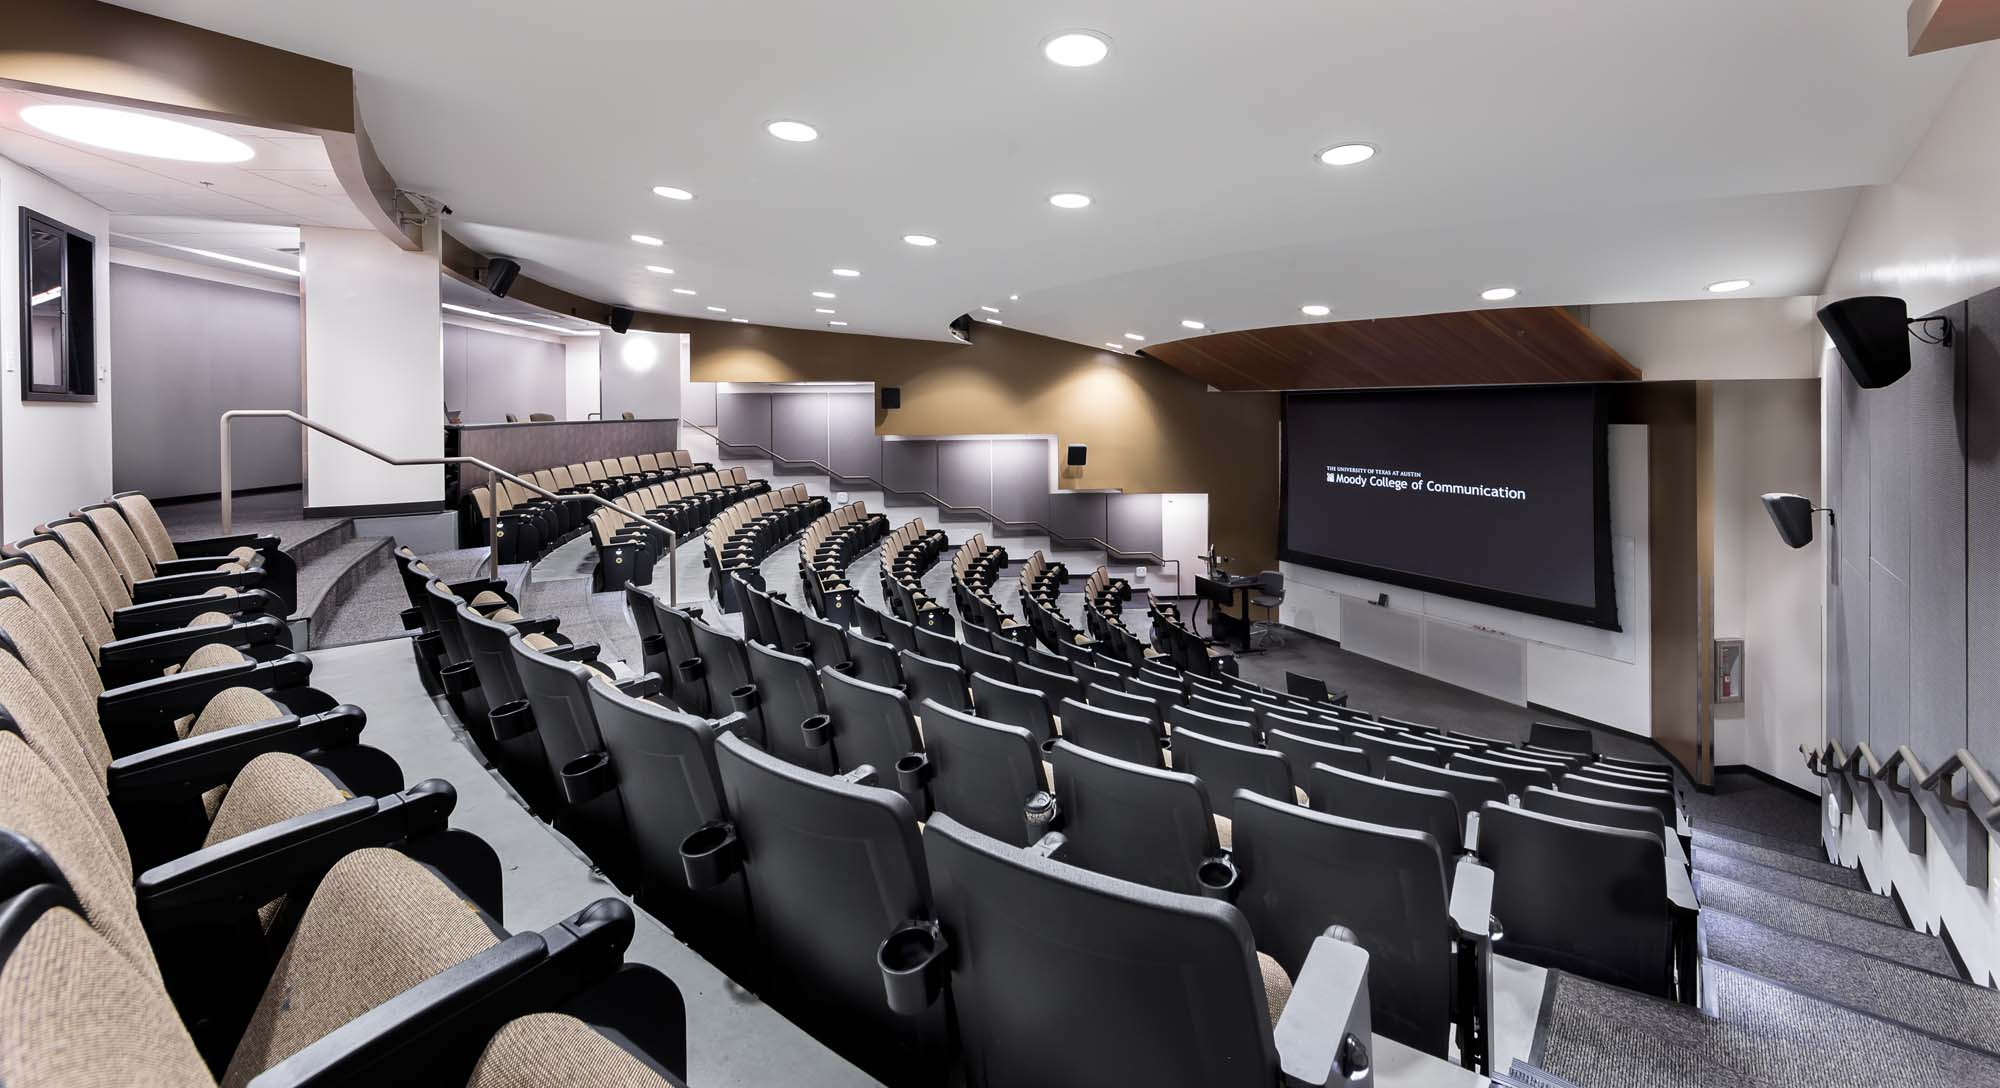 Design A Parking Garage Cma 2 306 University Auditorium Moody College Of